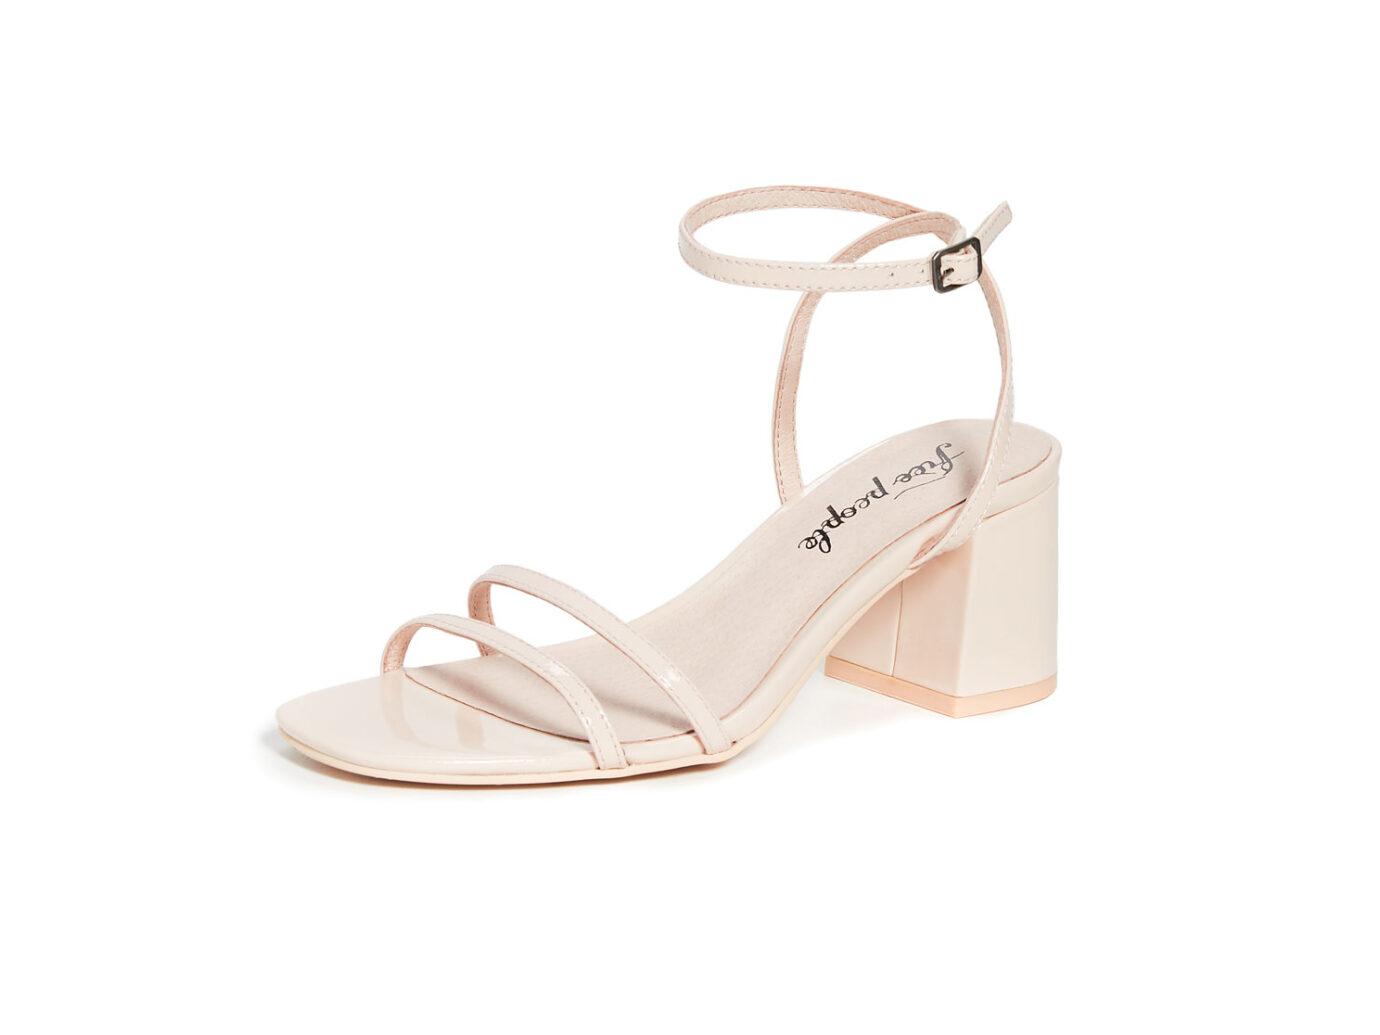 Free People Gabby Block Heel Sandals